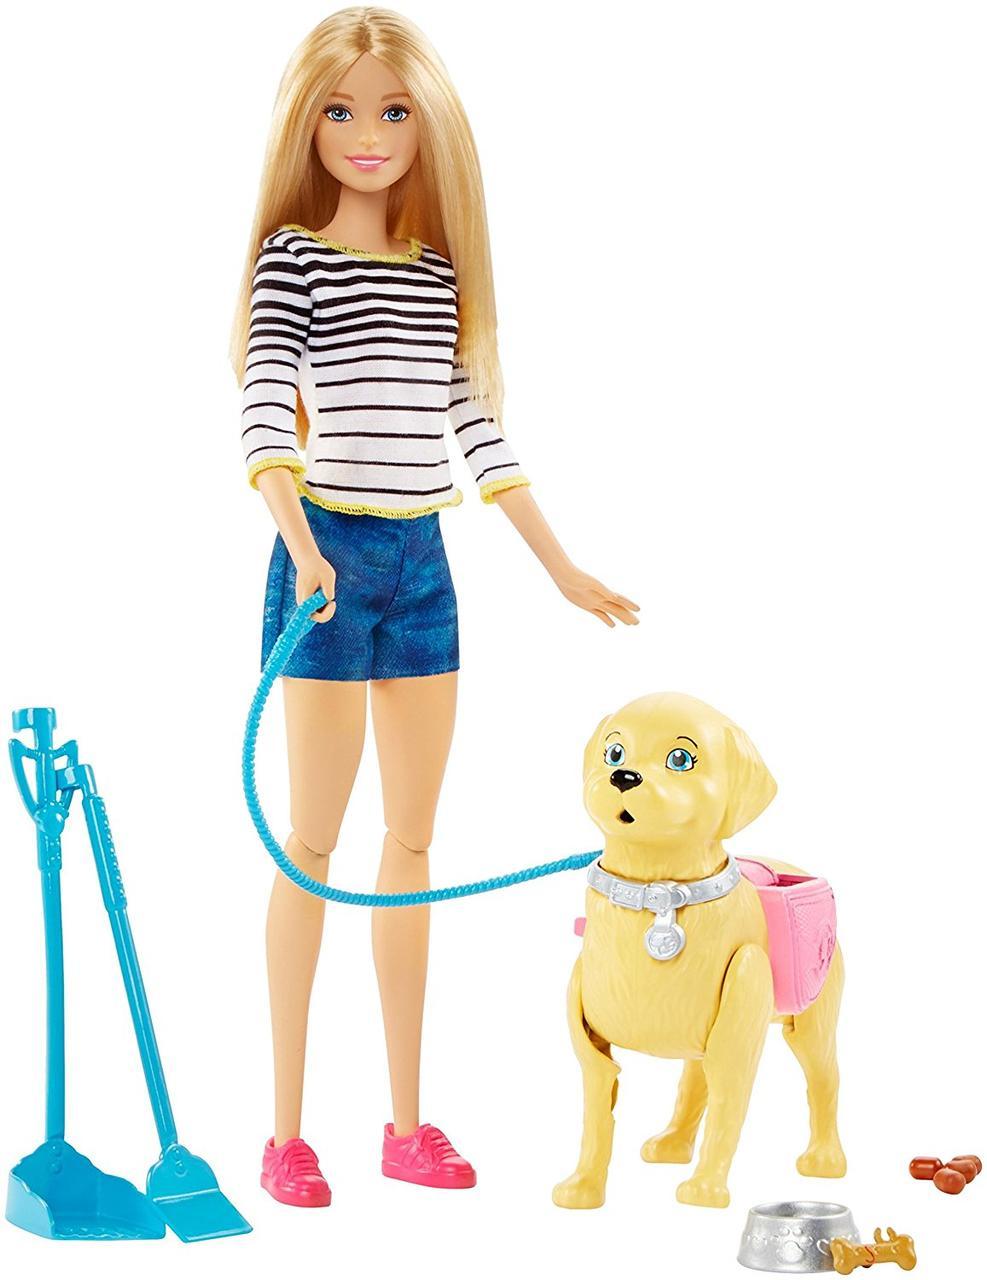 Кукла Барби Прогулка с щенком Barbie Girls Walk and Potty Pup with Blonde Doll